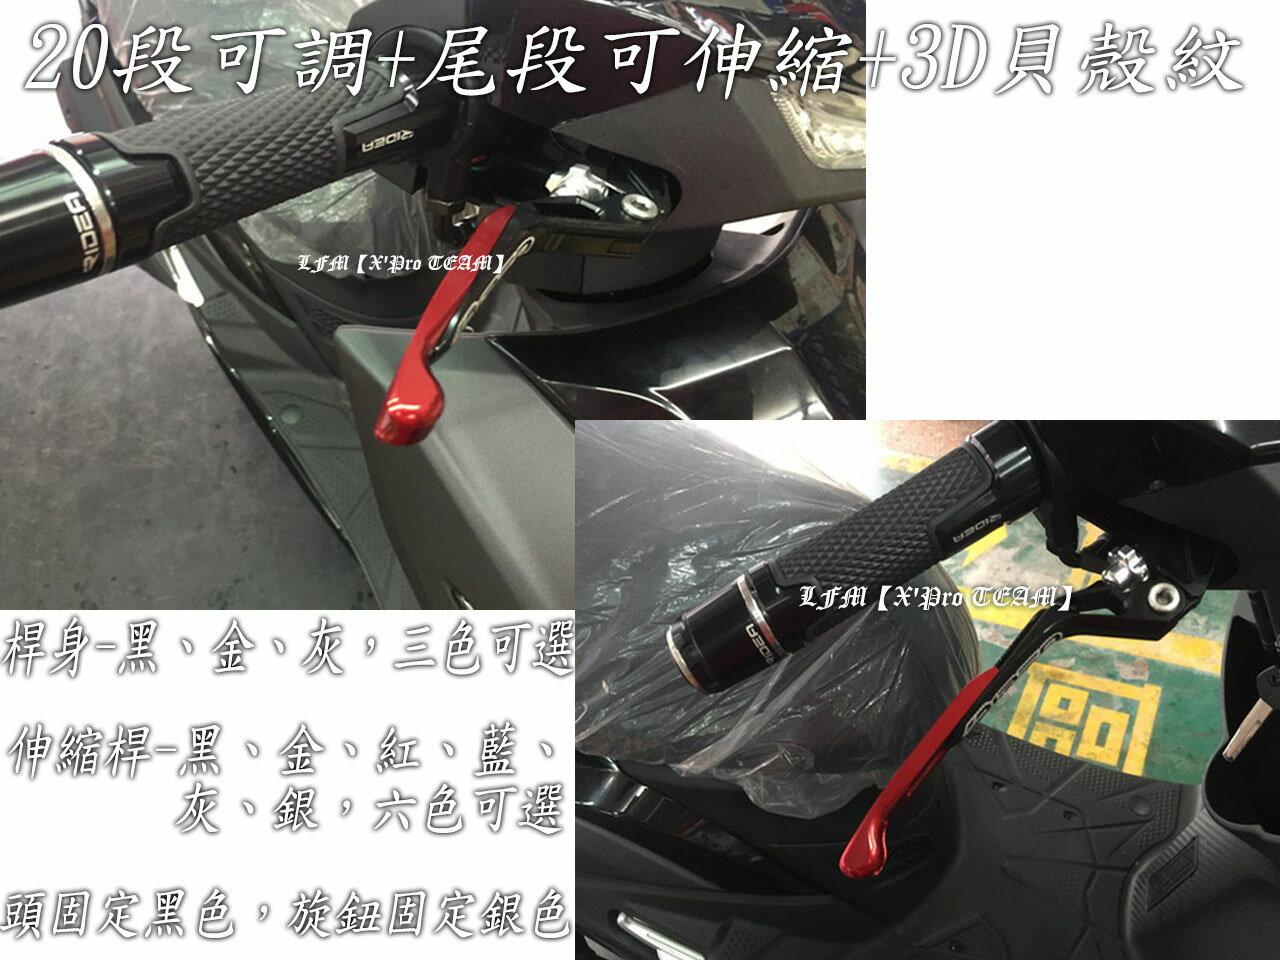 【LFM】RIDEA 宏佳騰 Ai-1 Sport 可調式煞車拉桿 剎車拉桿 附手煞車 3D 標準版 可折 可伸縮 延長 5